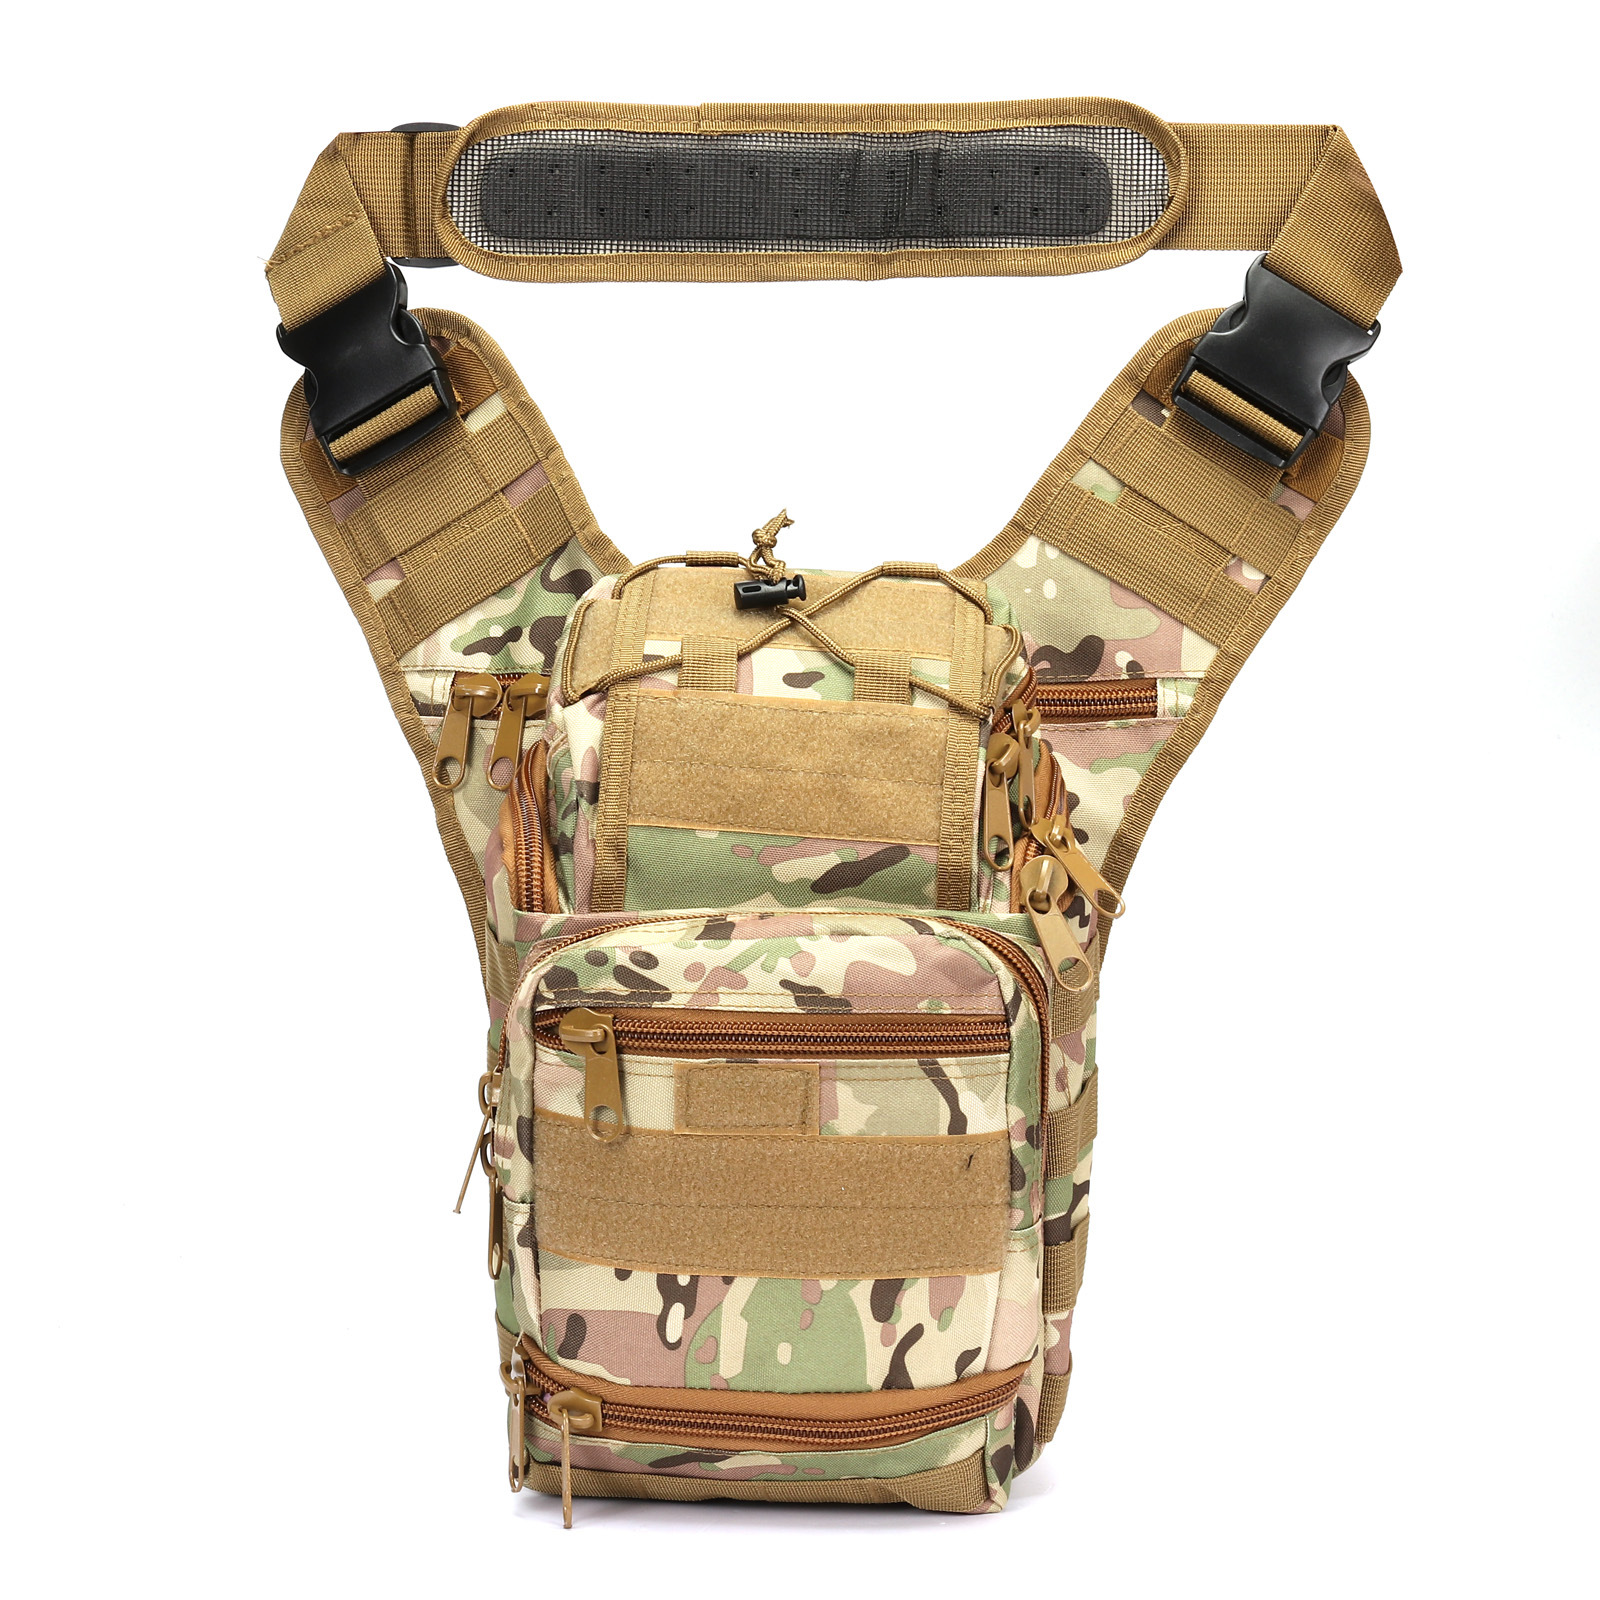 Outdoor Army Fans Tactical Mantis Moth Saddle Bag Alforja Men Outdoor Riding Shoulder Bag Camera Bag Outdoor Mountaineering Bag